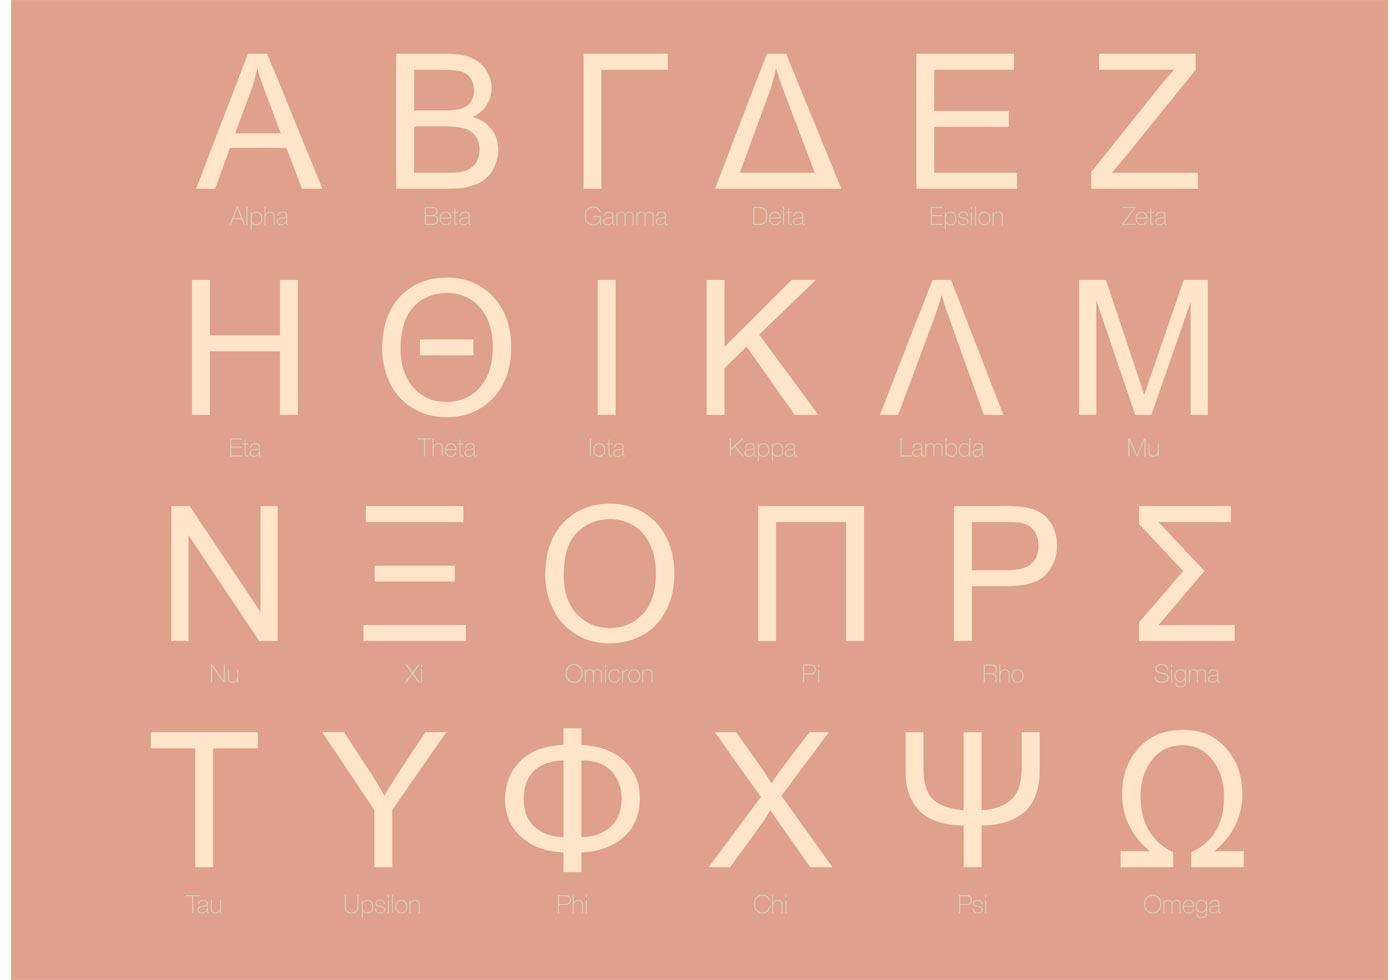 sans-serif-greek-alphabet-set-vector Tau Kappa Epsilon Letter Template on kappa alpha order letters, kappa kappa gamma letters, kappa delta rho letters, theta tau letters, phi kappa tau letters, kappa phi lambda letters, phi kappa theta letters, zeta beta tau letters, pi kappa alpha letters, alpha sigma tau letters, kappa sigma letters, delta kappa epsilon letters, sigma alpha epsilon letters, tau beta phi letters, pi kappa phi letters, sigma phi epsilon greek letters, delta phi epsilon letters, alpha tau omega letters, alpha kappa alpha letters, kappa alpha theta letters,